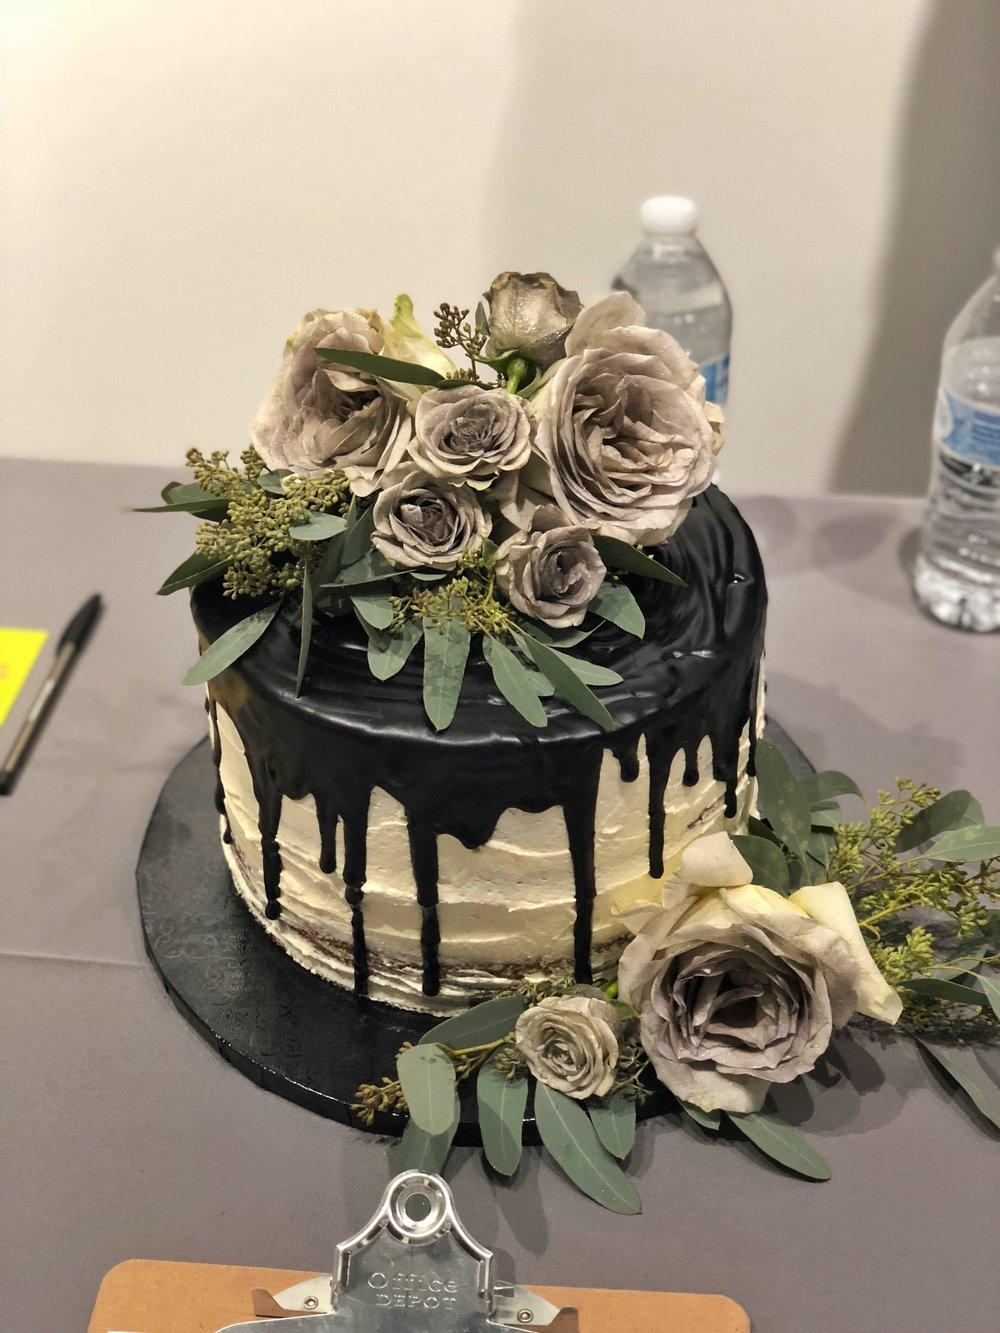 depressed-cake-shop-3.jpg